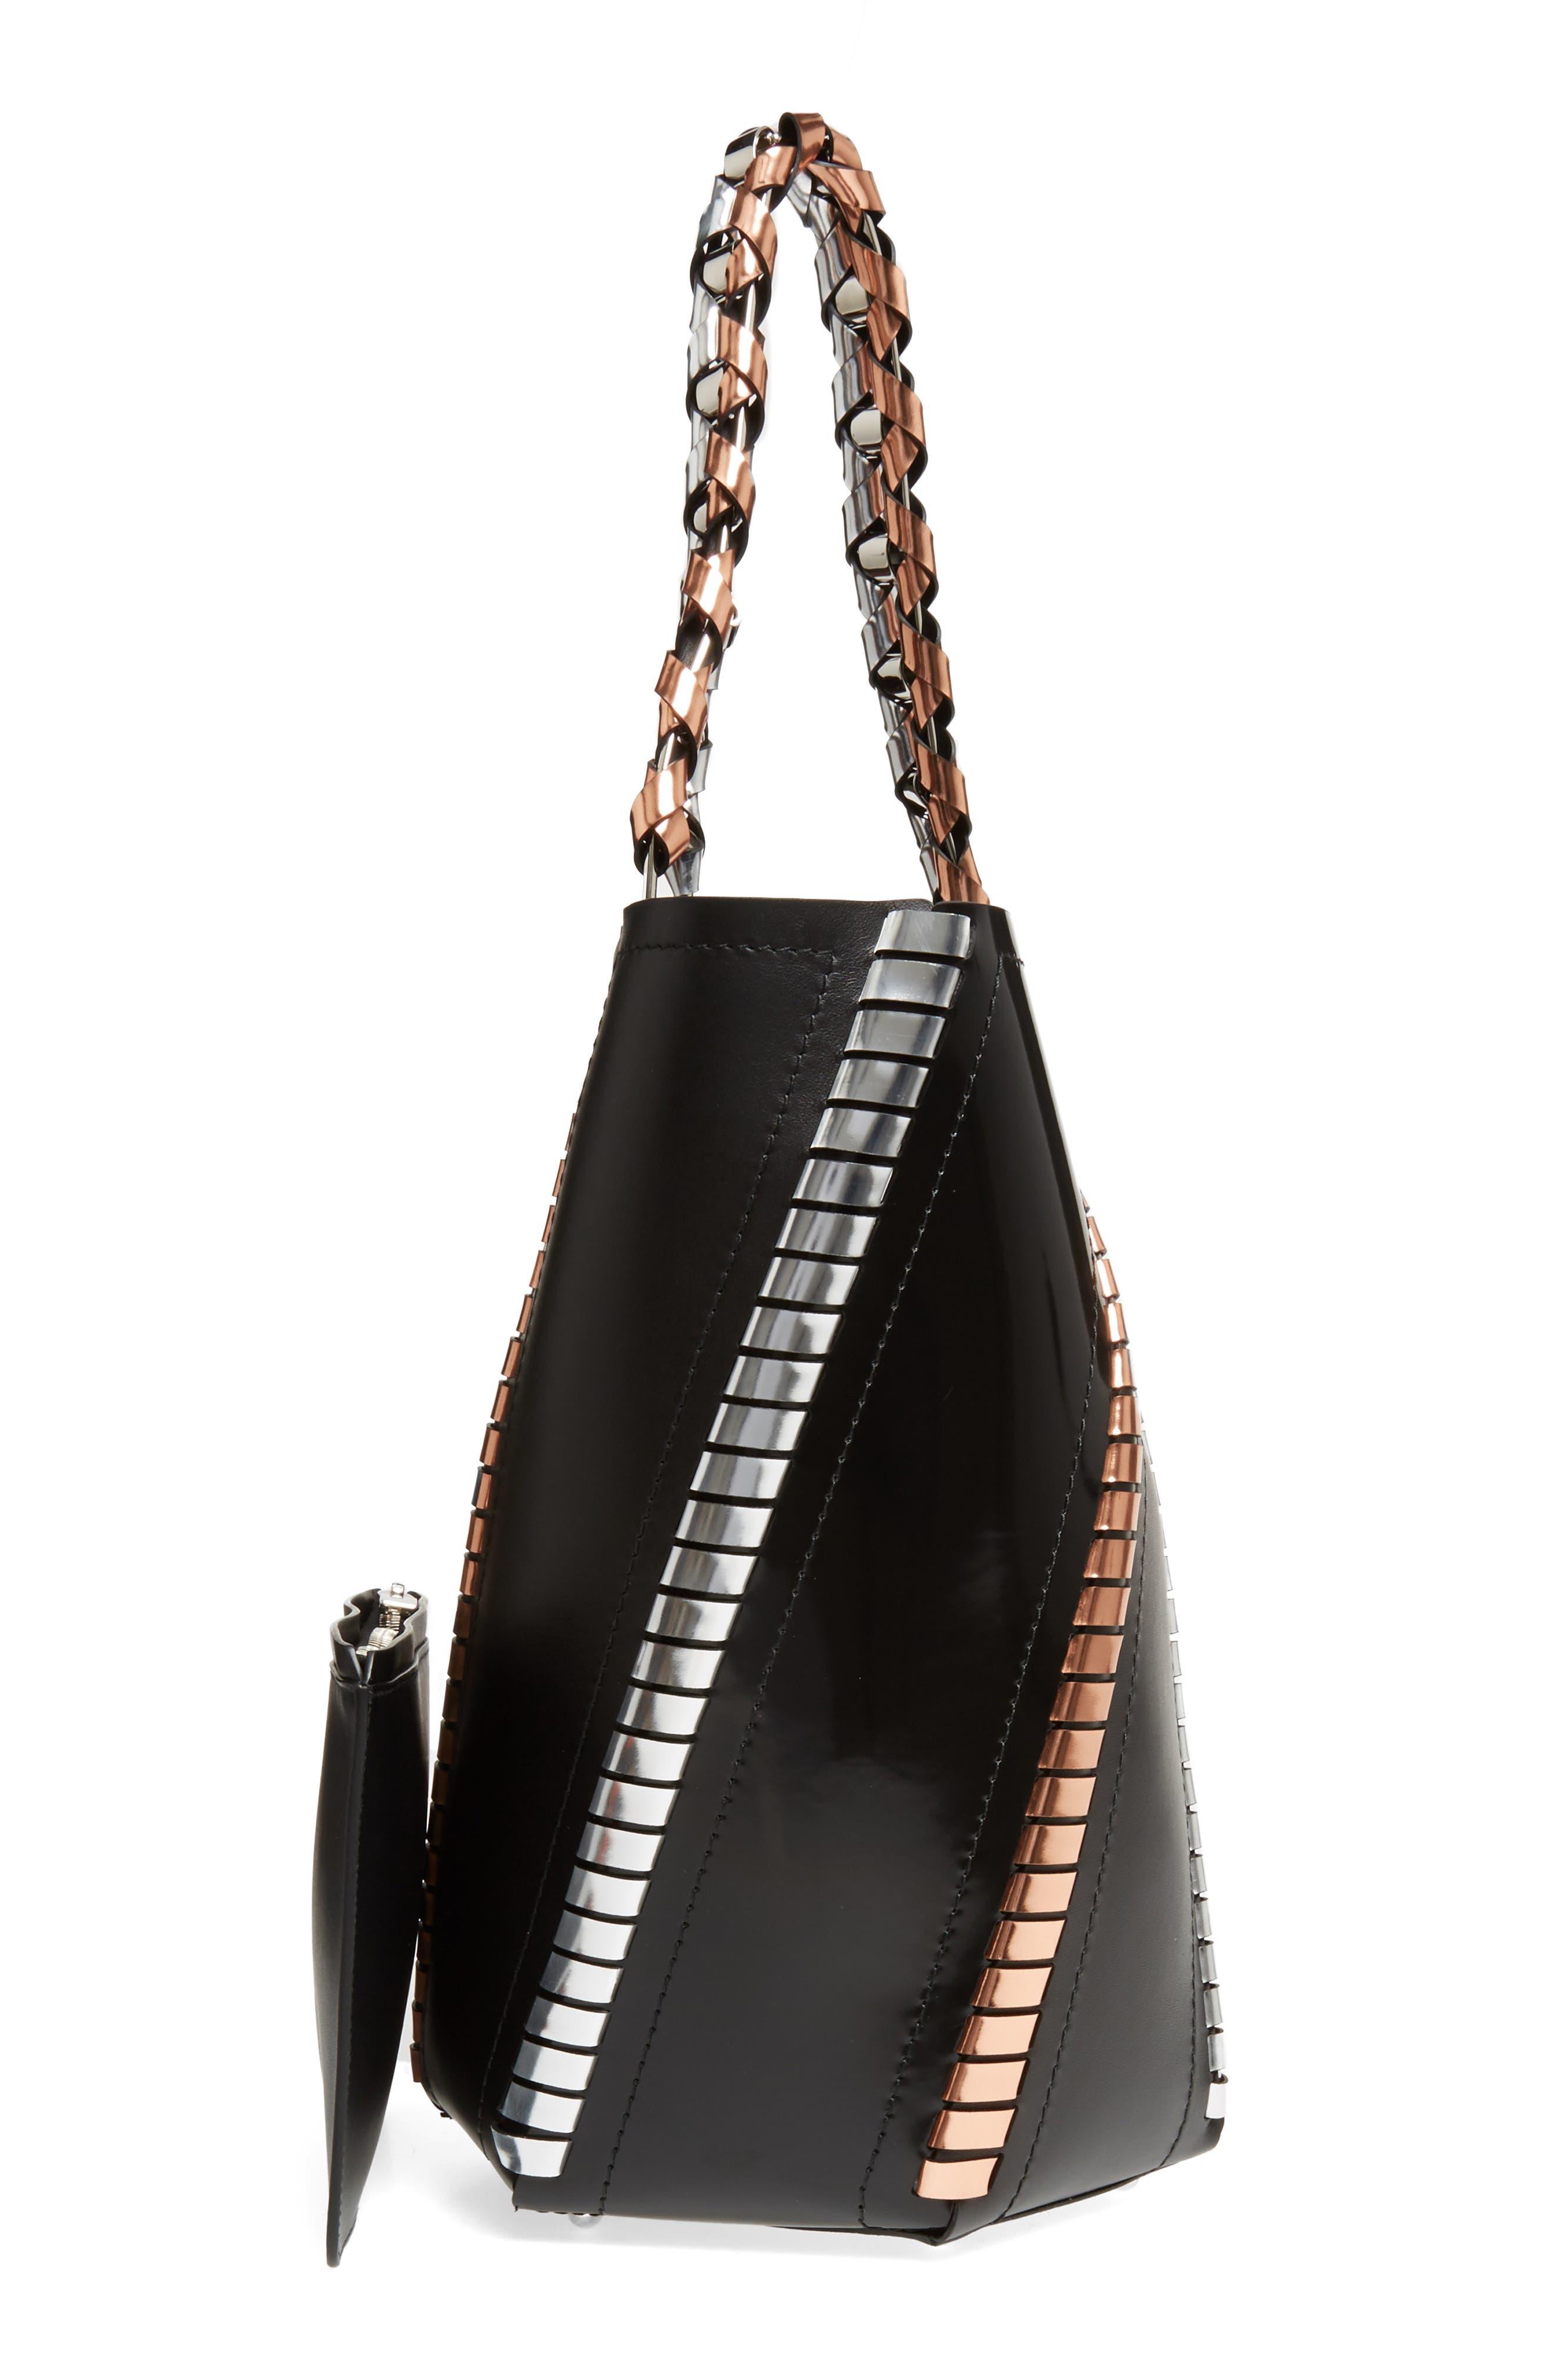 Medium Hex Metallic Whipstitch Leather Bucket Bag,                             Alternate thumbnail 3, color,                             Black Mix